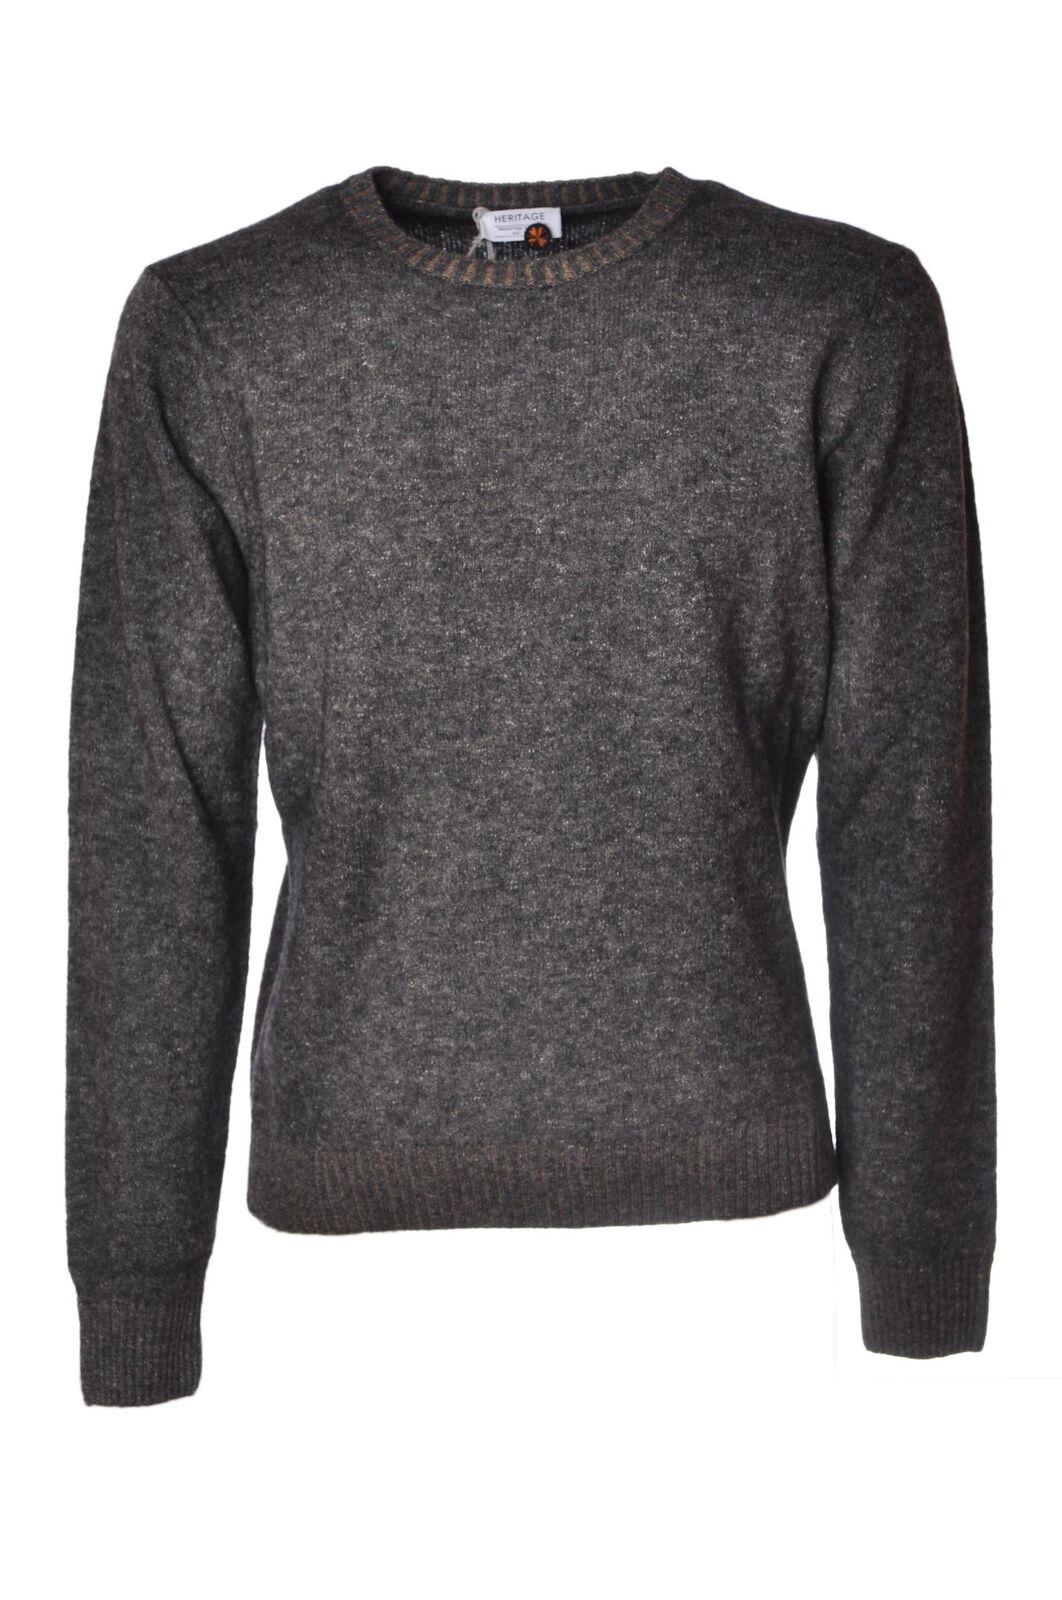 Heritage  -  Sweaters - Male - Grau - 4355926A184731